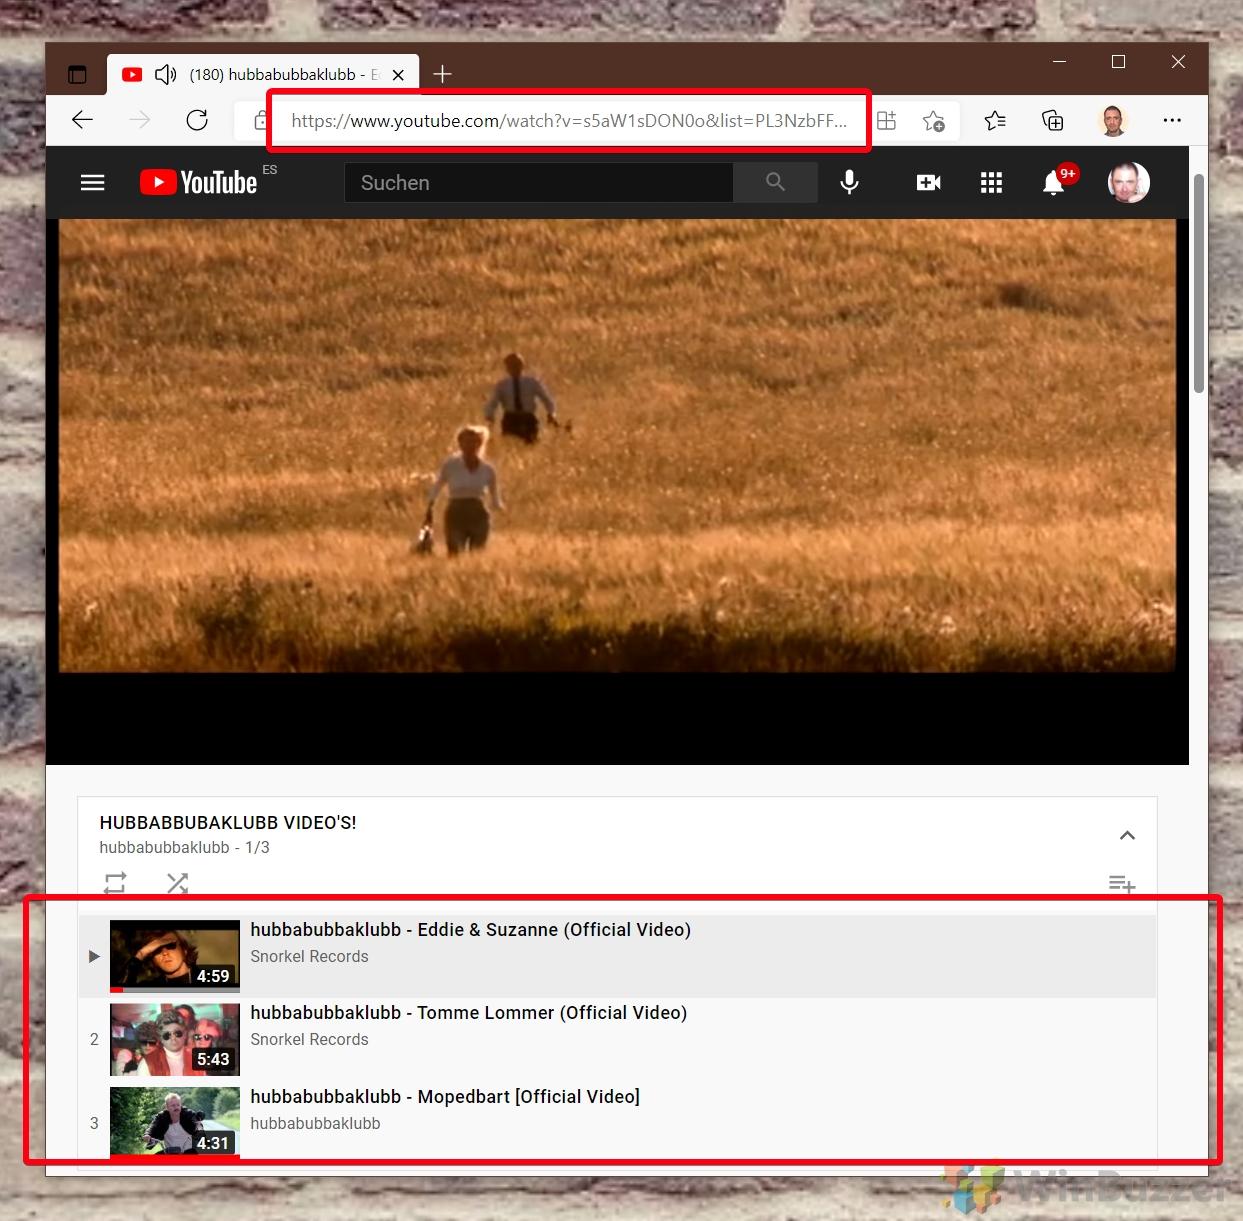 "YouTube - Playlist - Copier l'URL"" width=""1243"" height=""1221"" srcset=""https://winbuzzer.com/wp-content/uploads/2021/06/06-YouTube-Playlist-Copy-URL.jpg 1243w , https://winbuzzer.com/wp-content/uploads/2021/06/06-YouTube-Playlist-Copy-URL-300x295.jpg 300w, https://winbuzzer.com/wp-content/uploads/2021/ 06/06-YouTube-Playlist-Copy-URL-1024x1006.jpg 1024w, https://winbuzzer.com/wp-content/uploads/2021/06/06-YouTube-Playlist-Copy-URL-768x754.jpg 768w, https://winbuzzer.com/wp-content/uploads/2021/06/06-YouTube-Playlist-Copy-URL-150x147.jpg 150w, https://winbuzzer.com/wp-content/uploads/2021/06 /06-YouTube-Playlist-Copy-URL-696x684.jpg 696w, https://winbuzzer.com/wp-content/uploads/2021/06/06-YouTube-Playlist-Copy-URL-1068x1049.jpg 1068w, https ://winbuzzer.com/wp-content/uploads/2021/06/06-YouTube-Playlist-Copy-URL-428x420.jpg 428w"" tailles=""(max-width: 1243px) 100vw, 1243px"